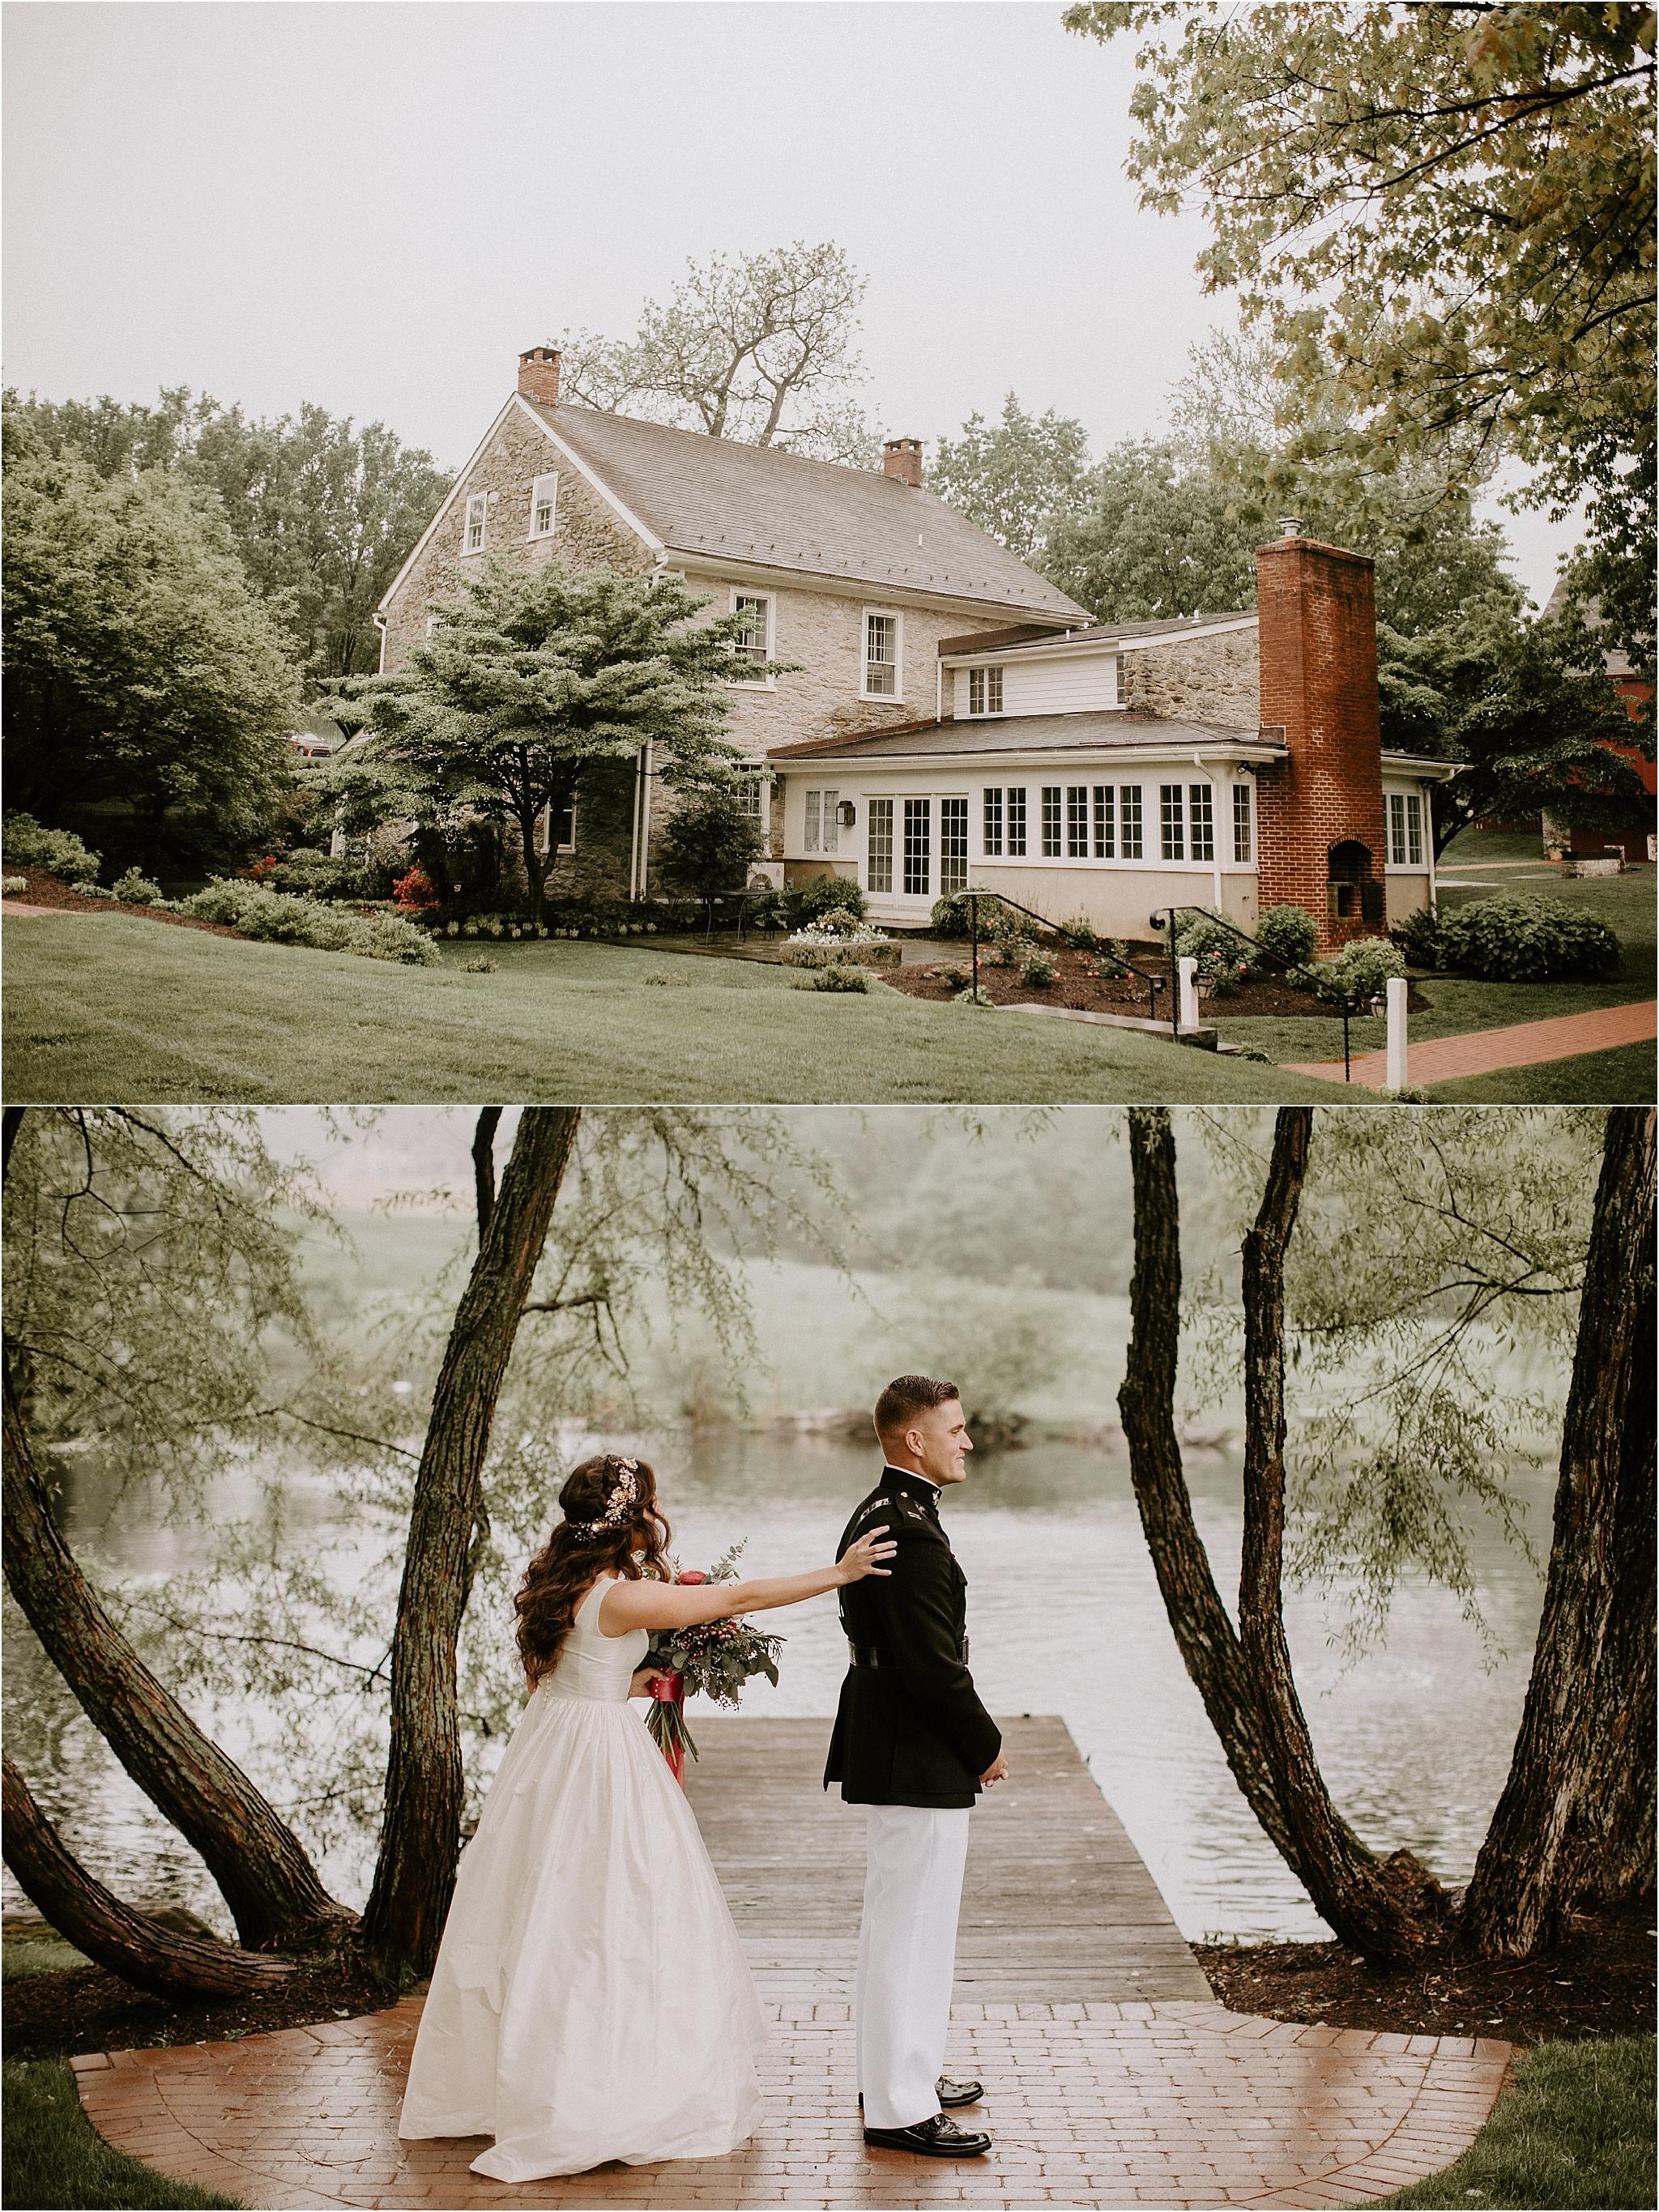 Sarah_Brookhart_Farm_at_Eagles_Ridge_Wedding_Photographer_0022.jpg